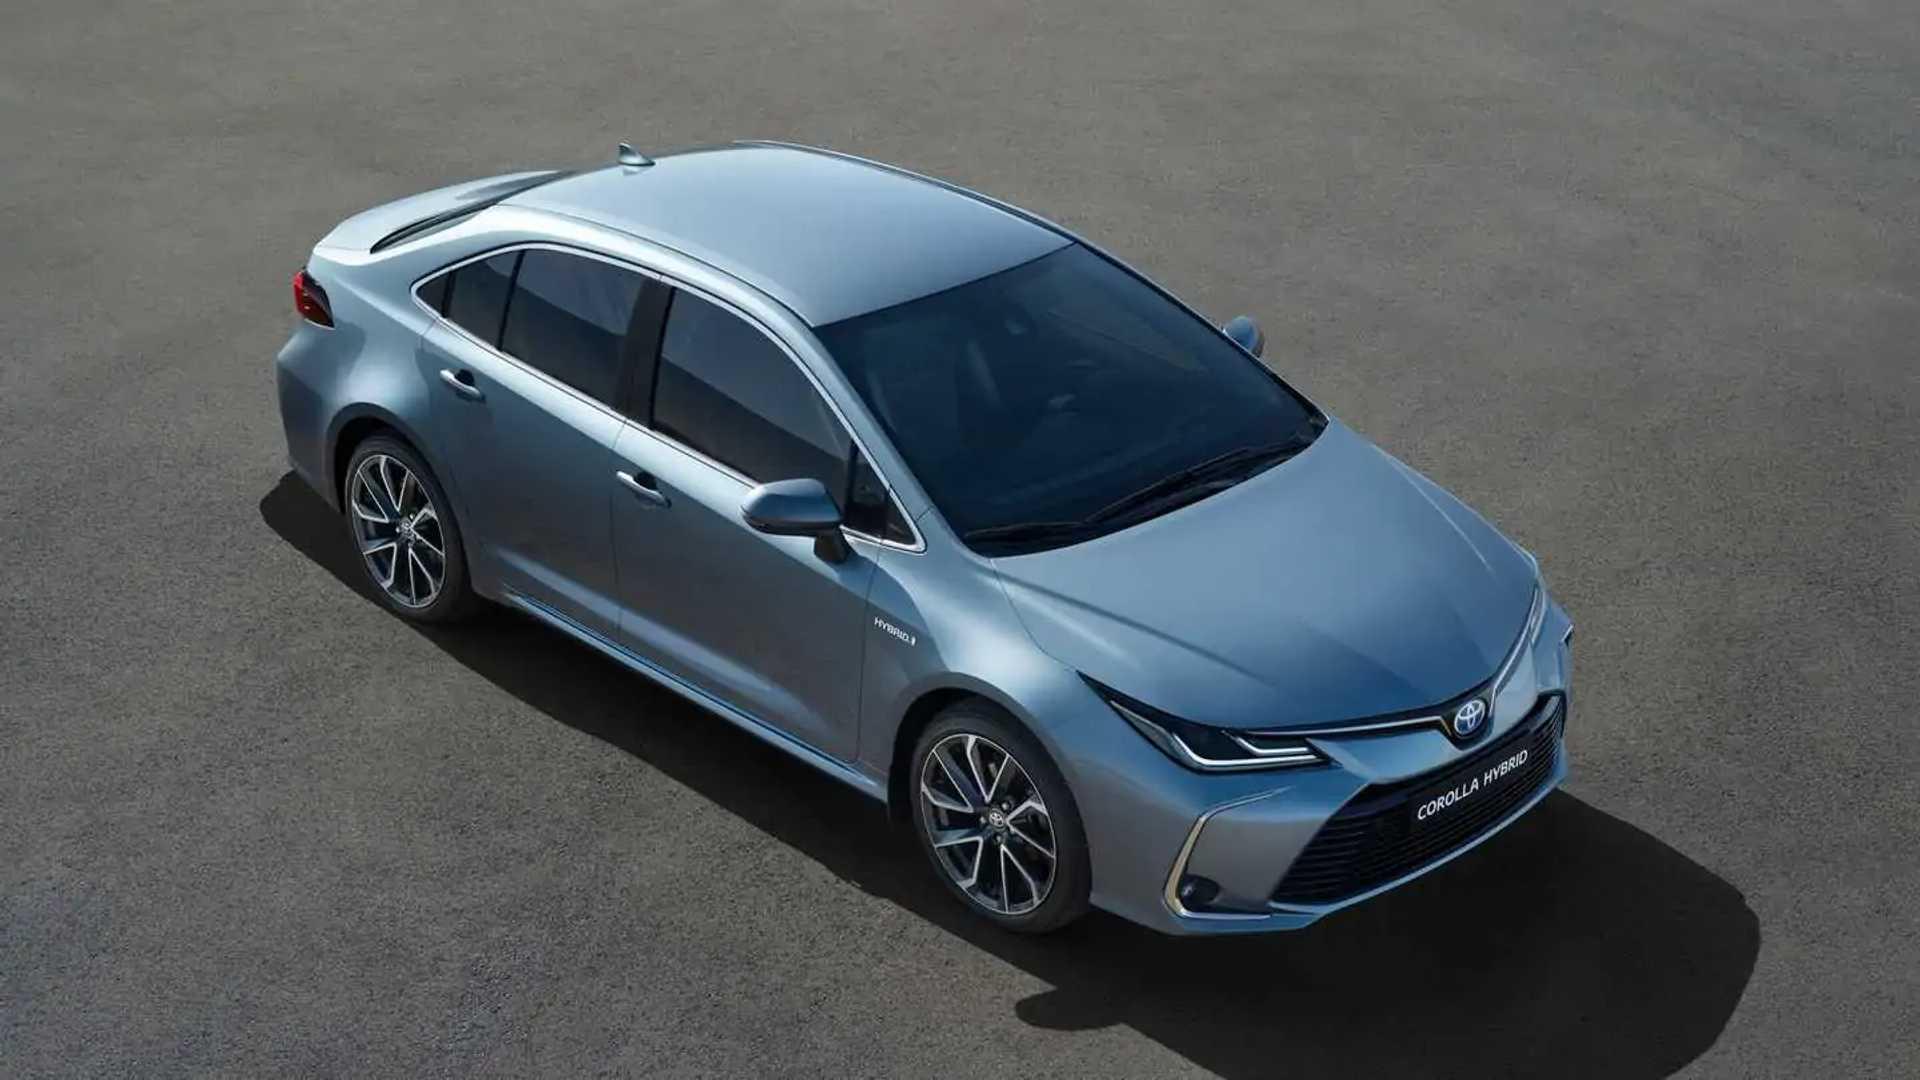 2020 Toyota Corolla Exterior and Interior